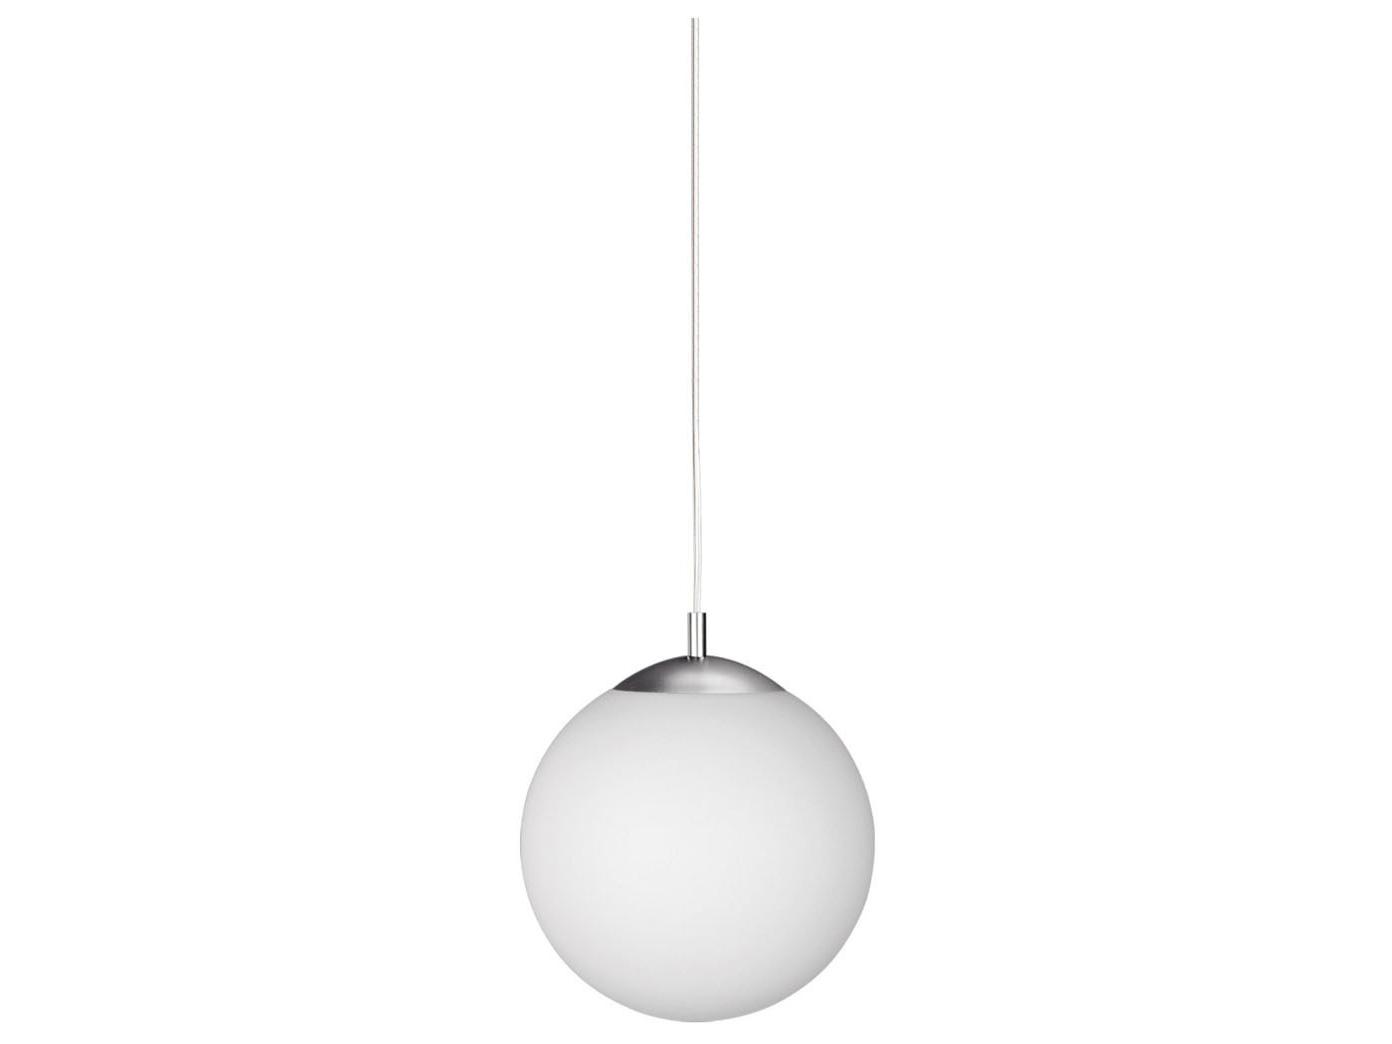 kugel pendelleuchte 30 cm glas opalwei wofi leuchten. Black Bedroom Furniture Sets. Home Design Ideas